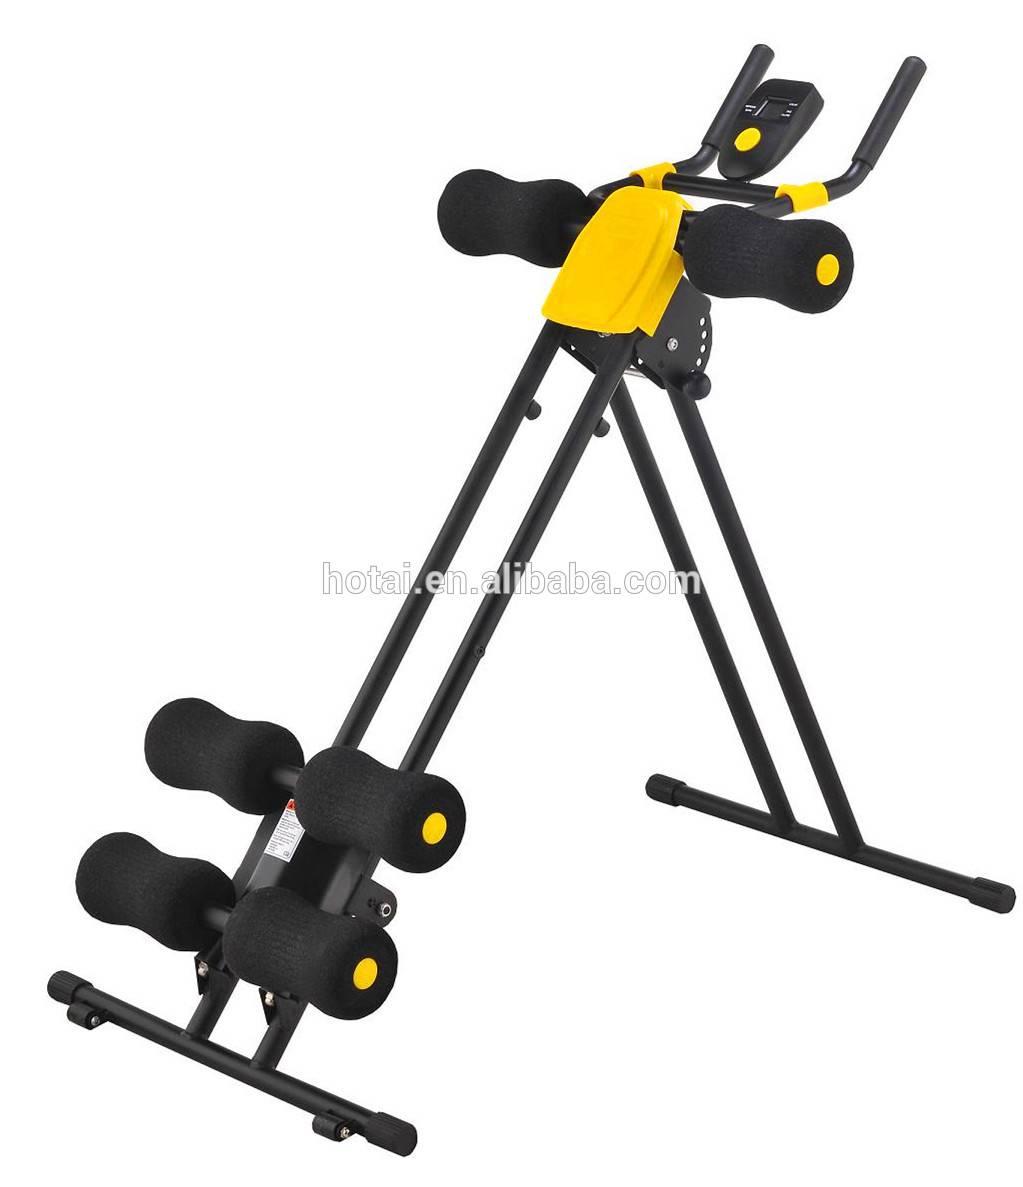 AB Power Plank Pro